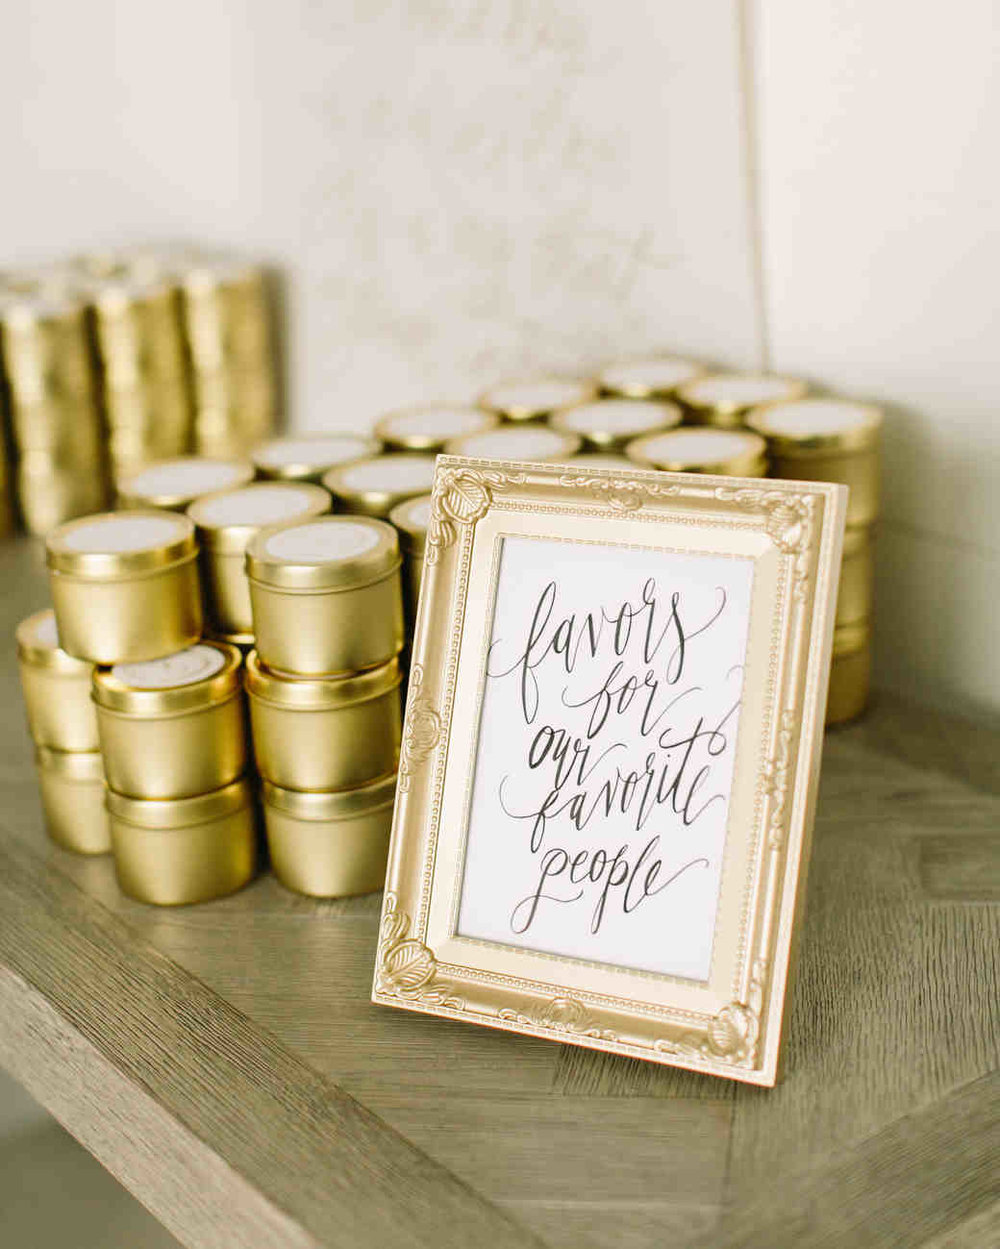 winter-wedding-favors-mustard-seed-photography-1117_vert.jpeg